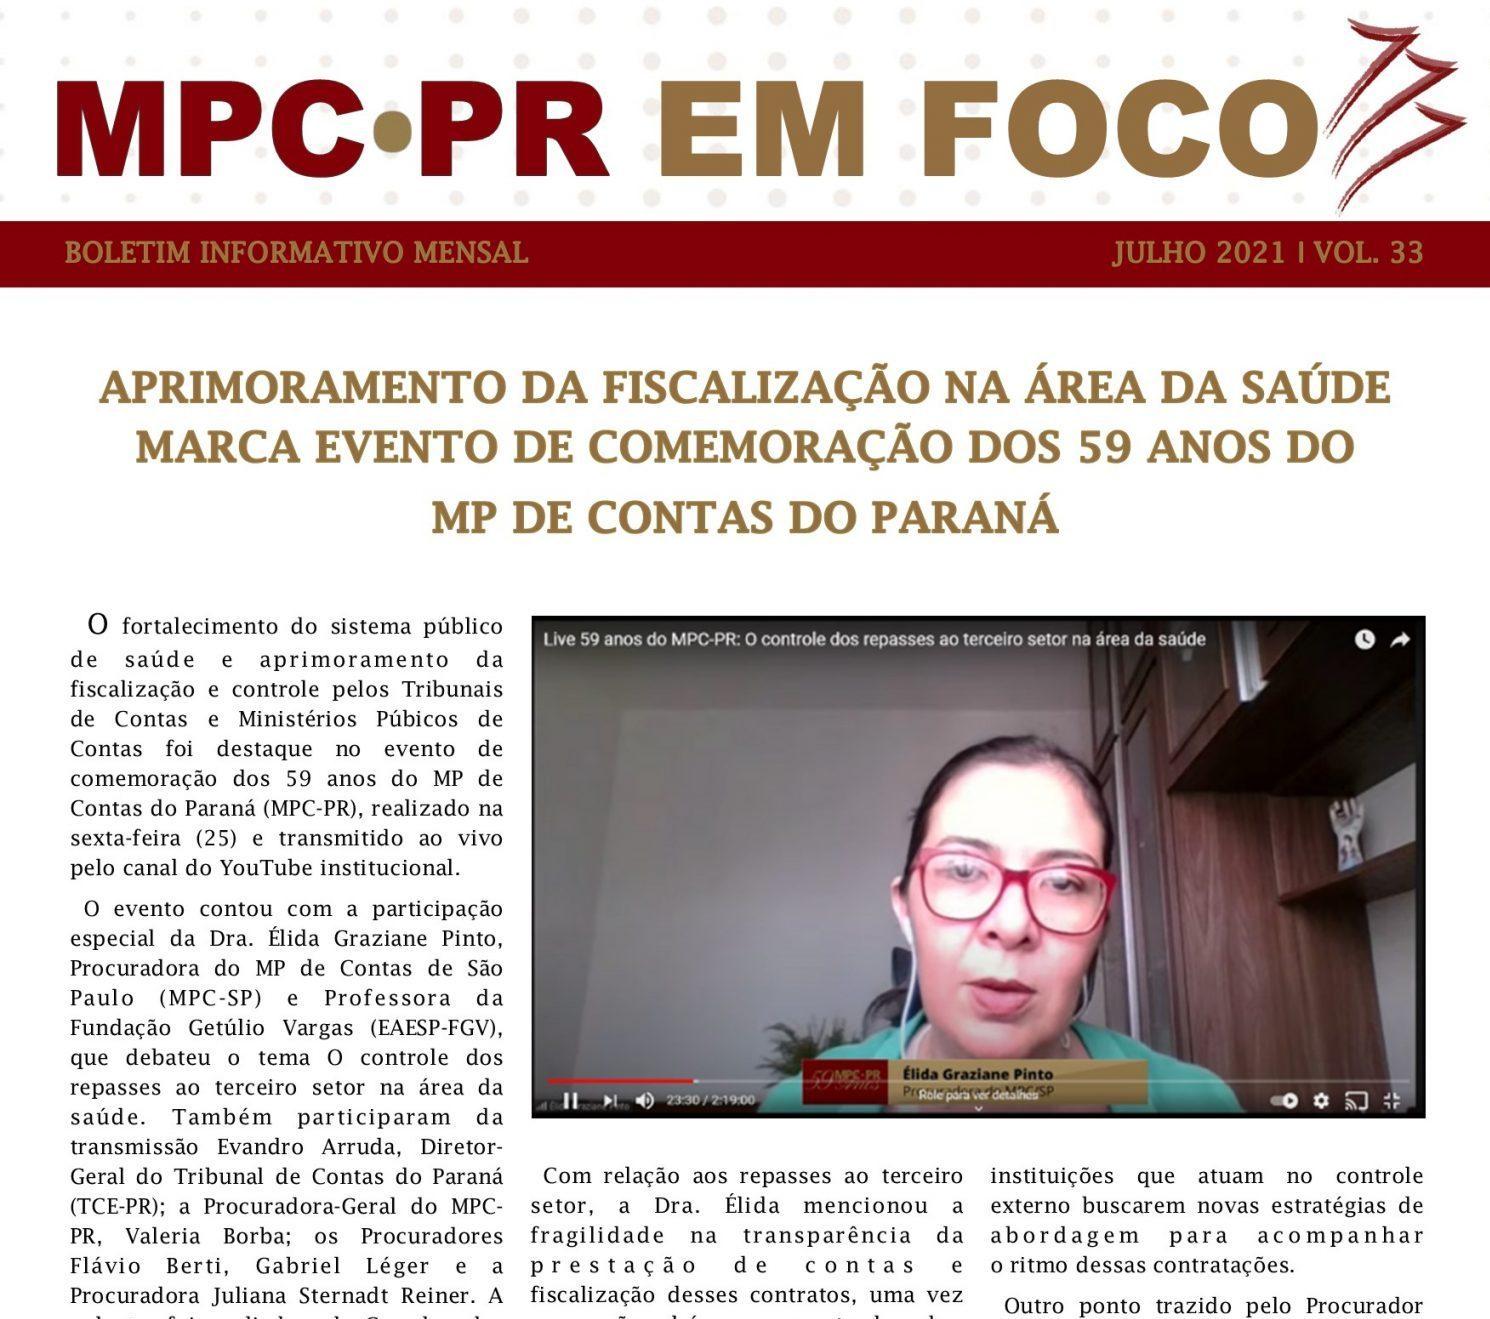 Boletim Informativo MPC-PR em Foco julho/2021